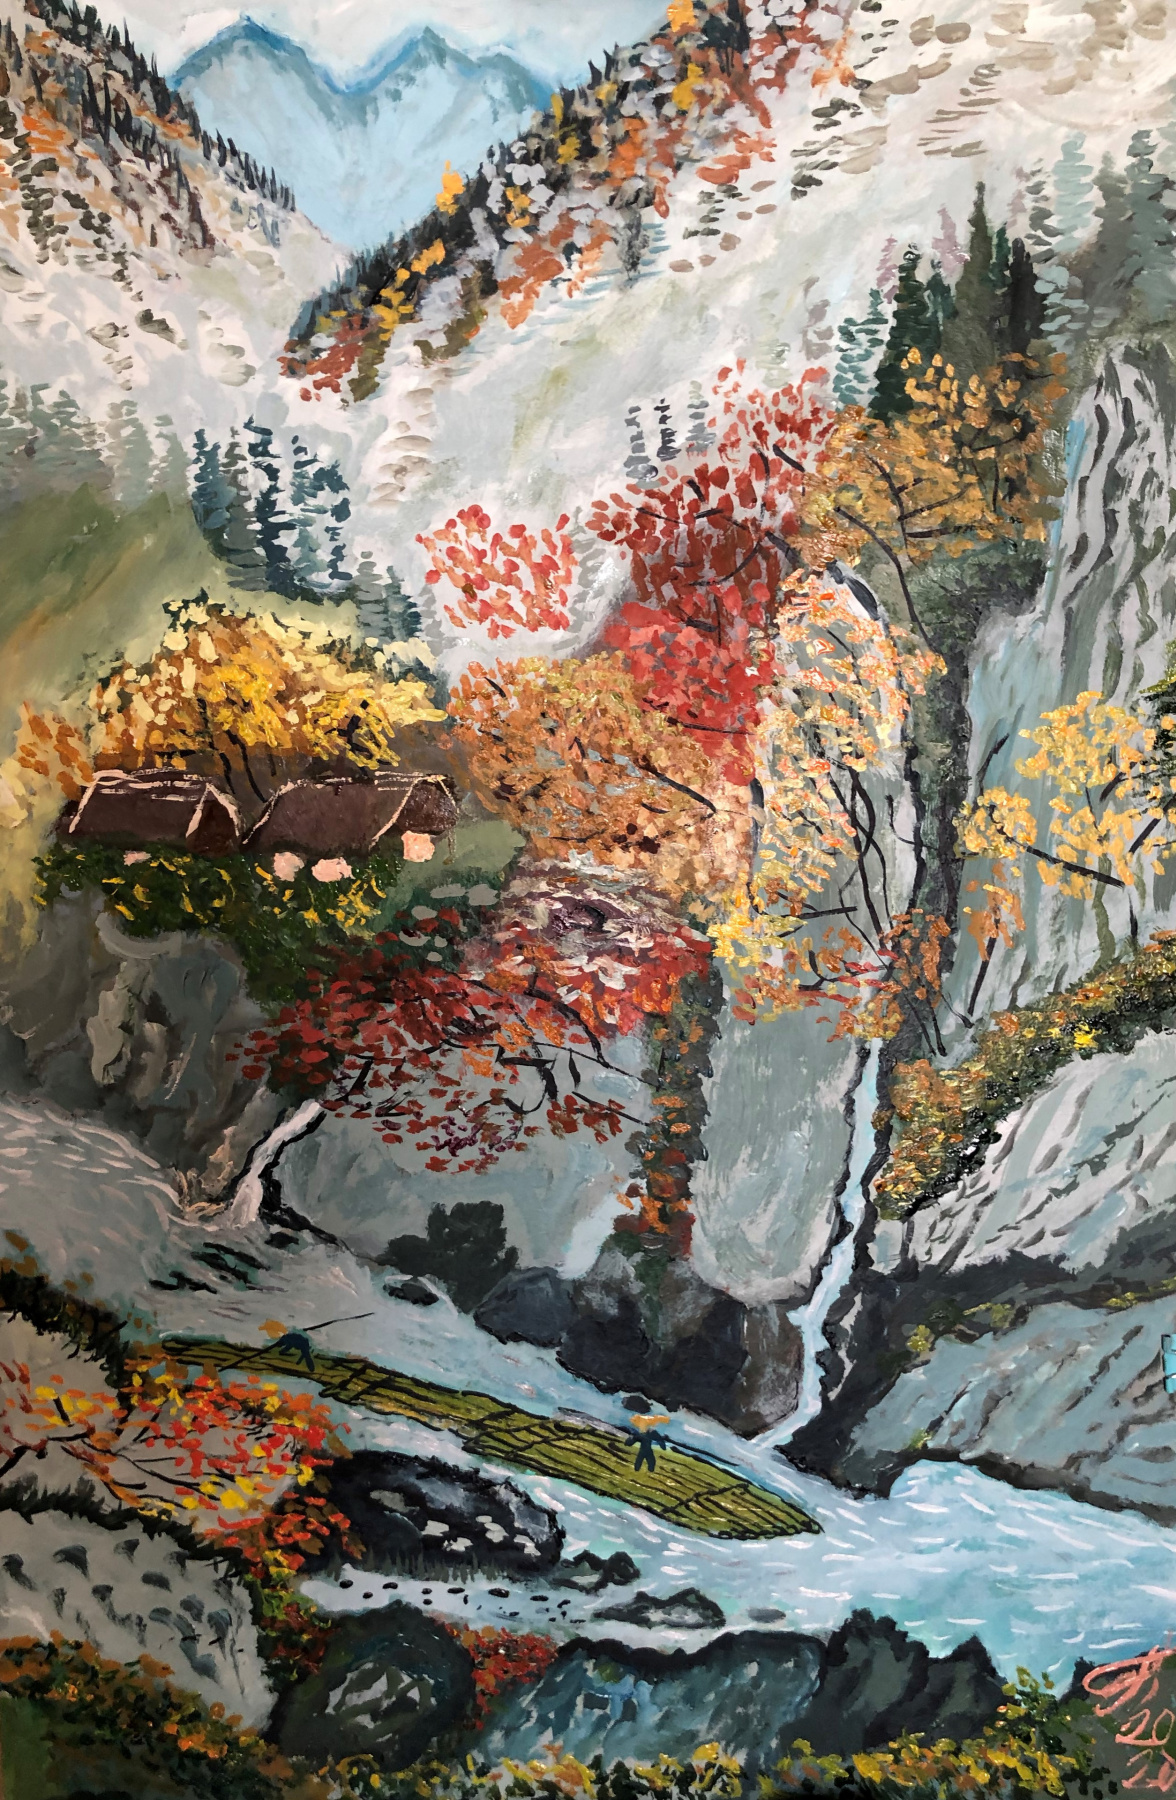 Sergey Vladimirovich Sebini. Landscape with a mountain river on the theme of Keukei Kojima